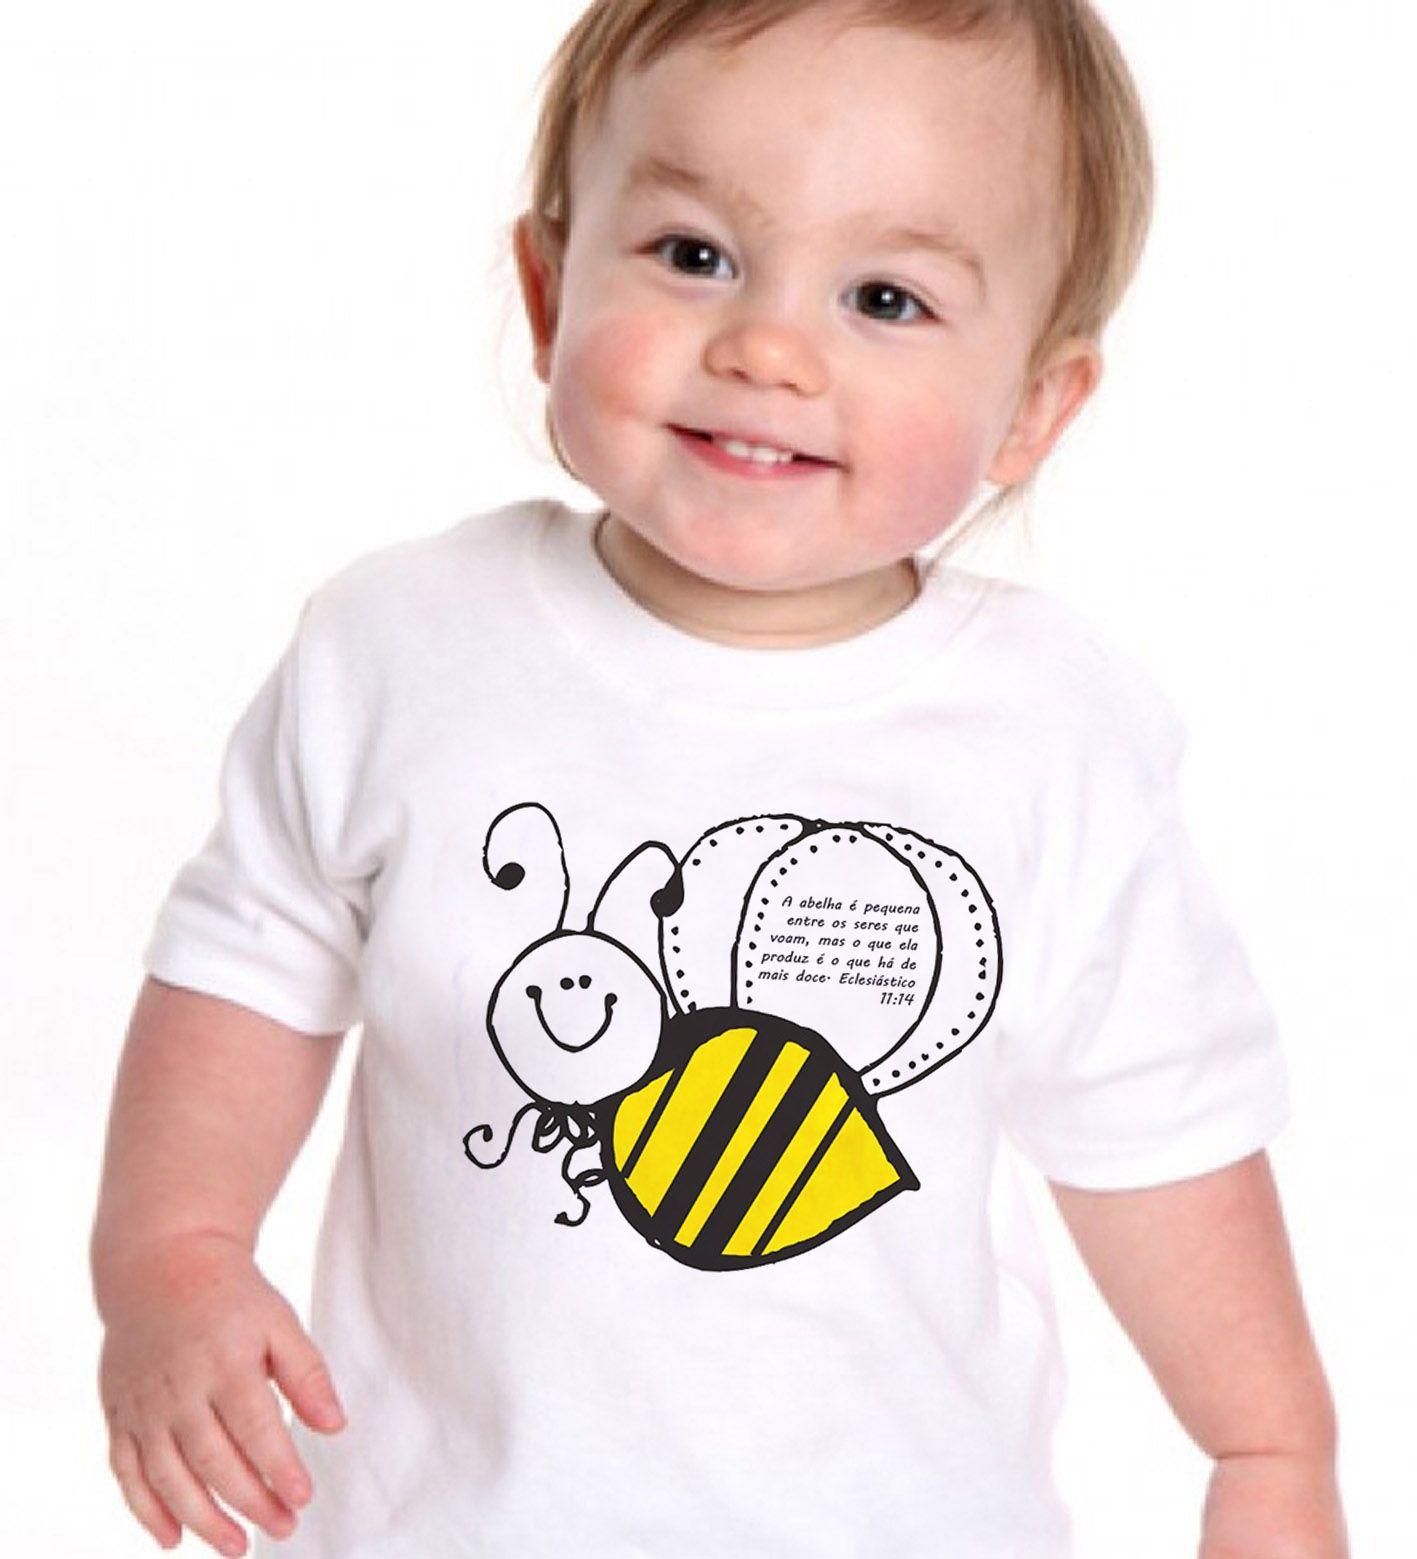 Camiseta  Cristã  Abelha de Deus - white  - Baby Monster S/A